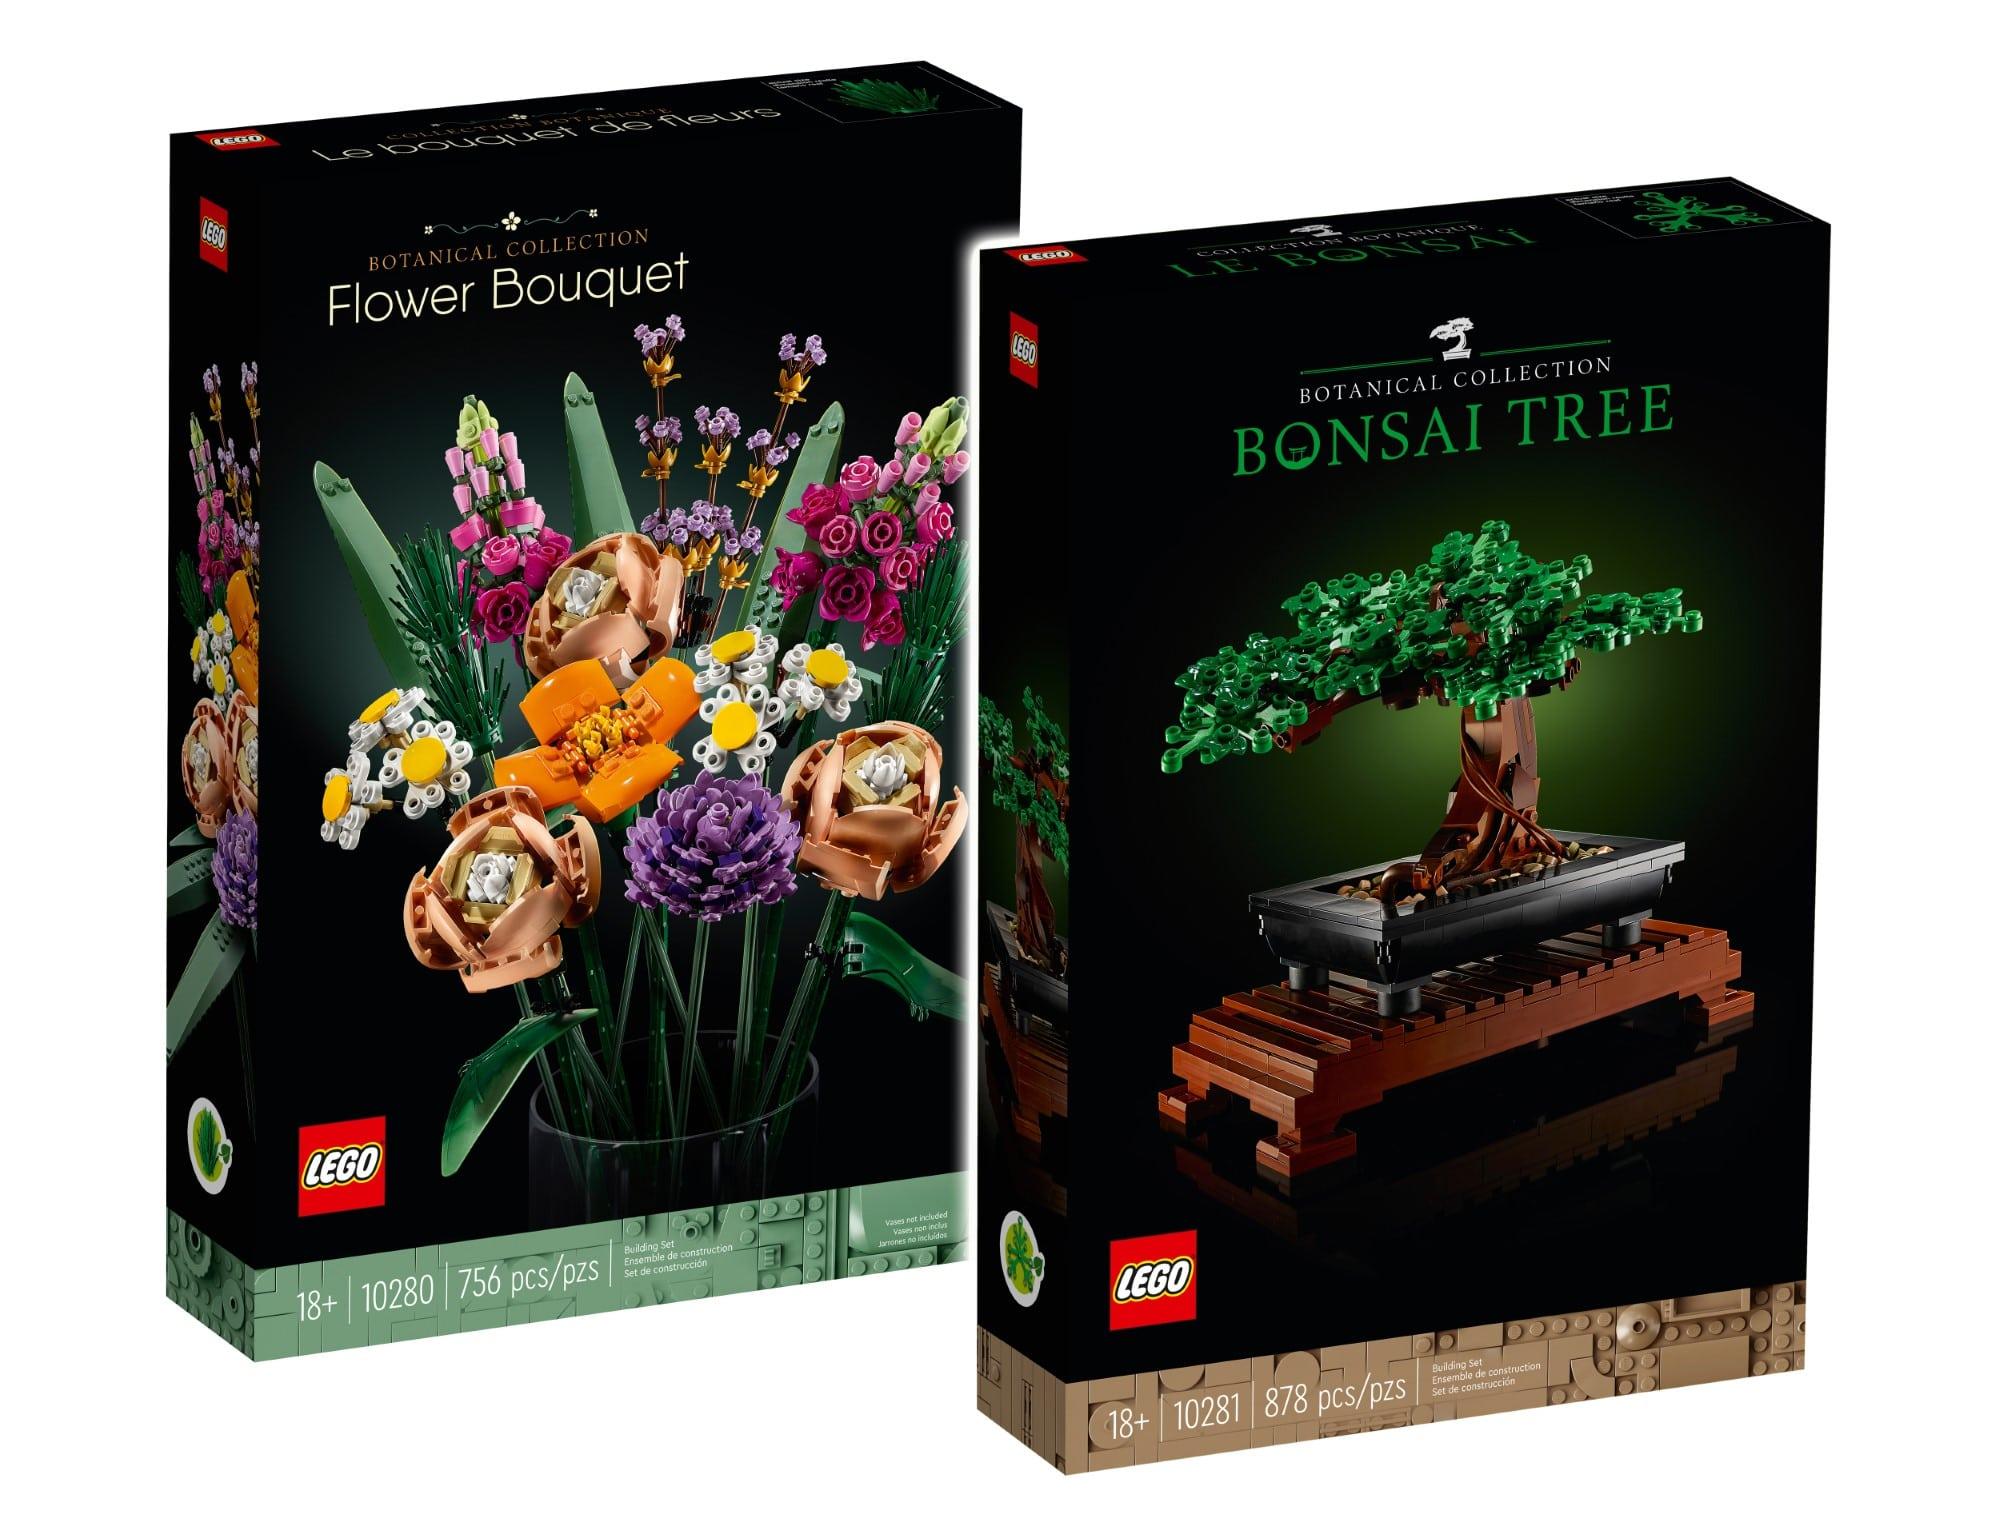 LEGO Botanical Collection Übersicht Boxen